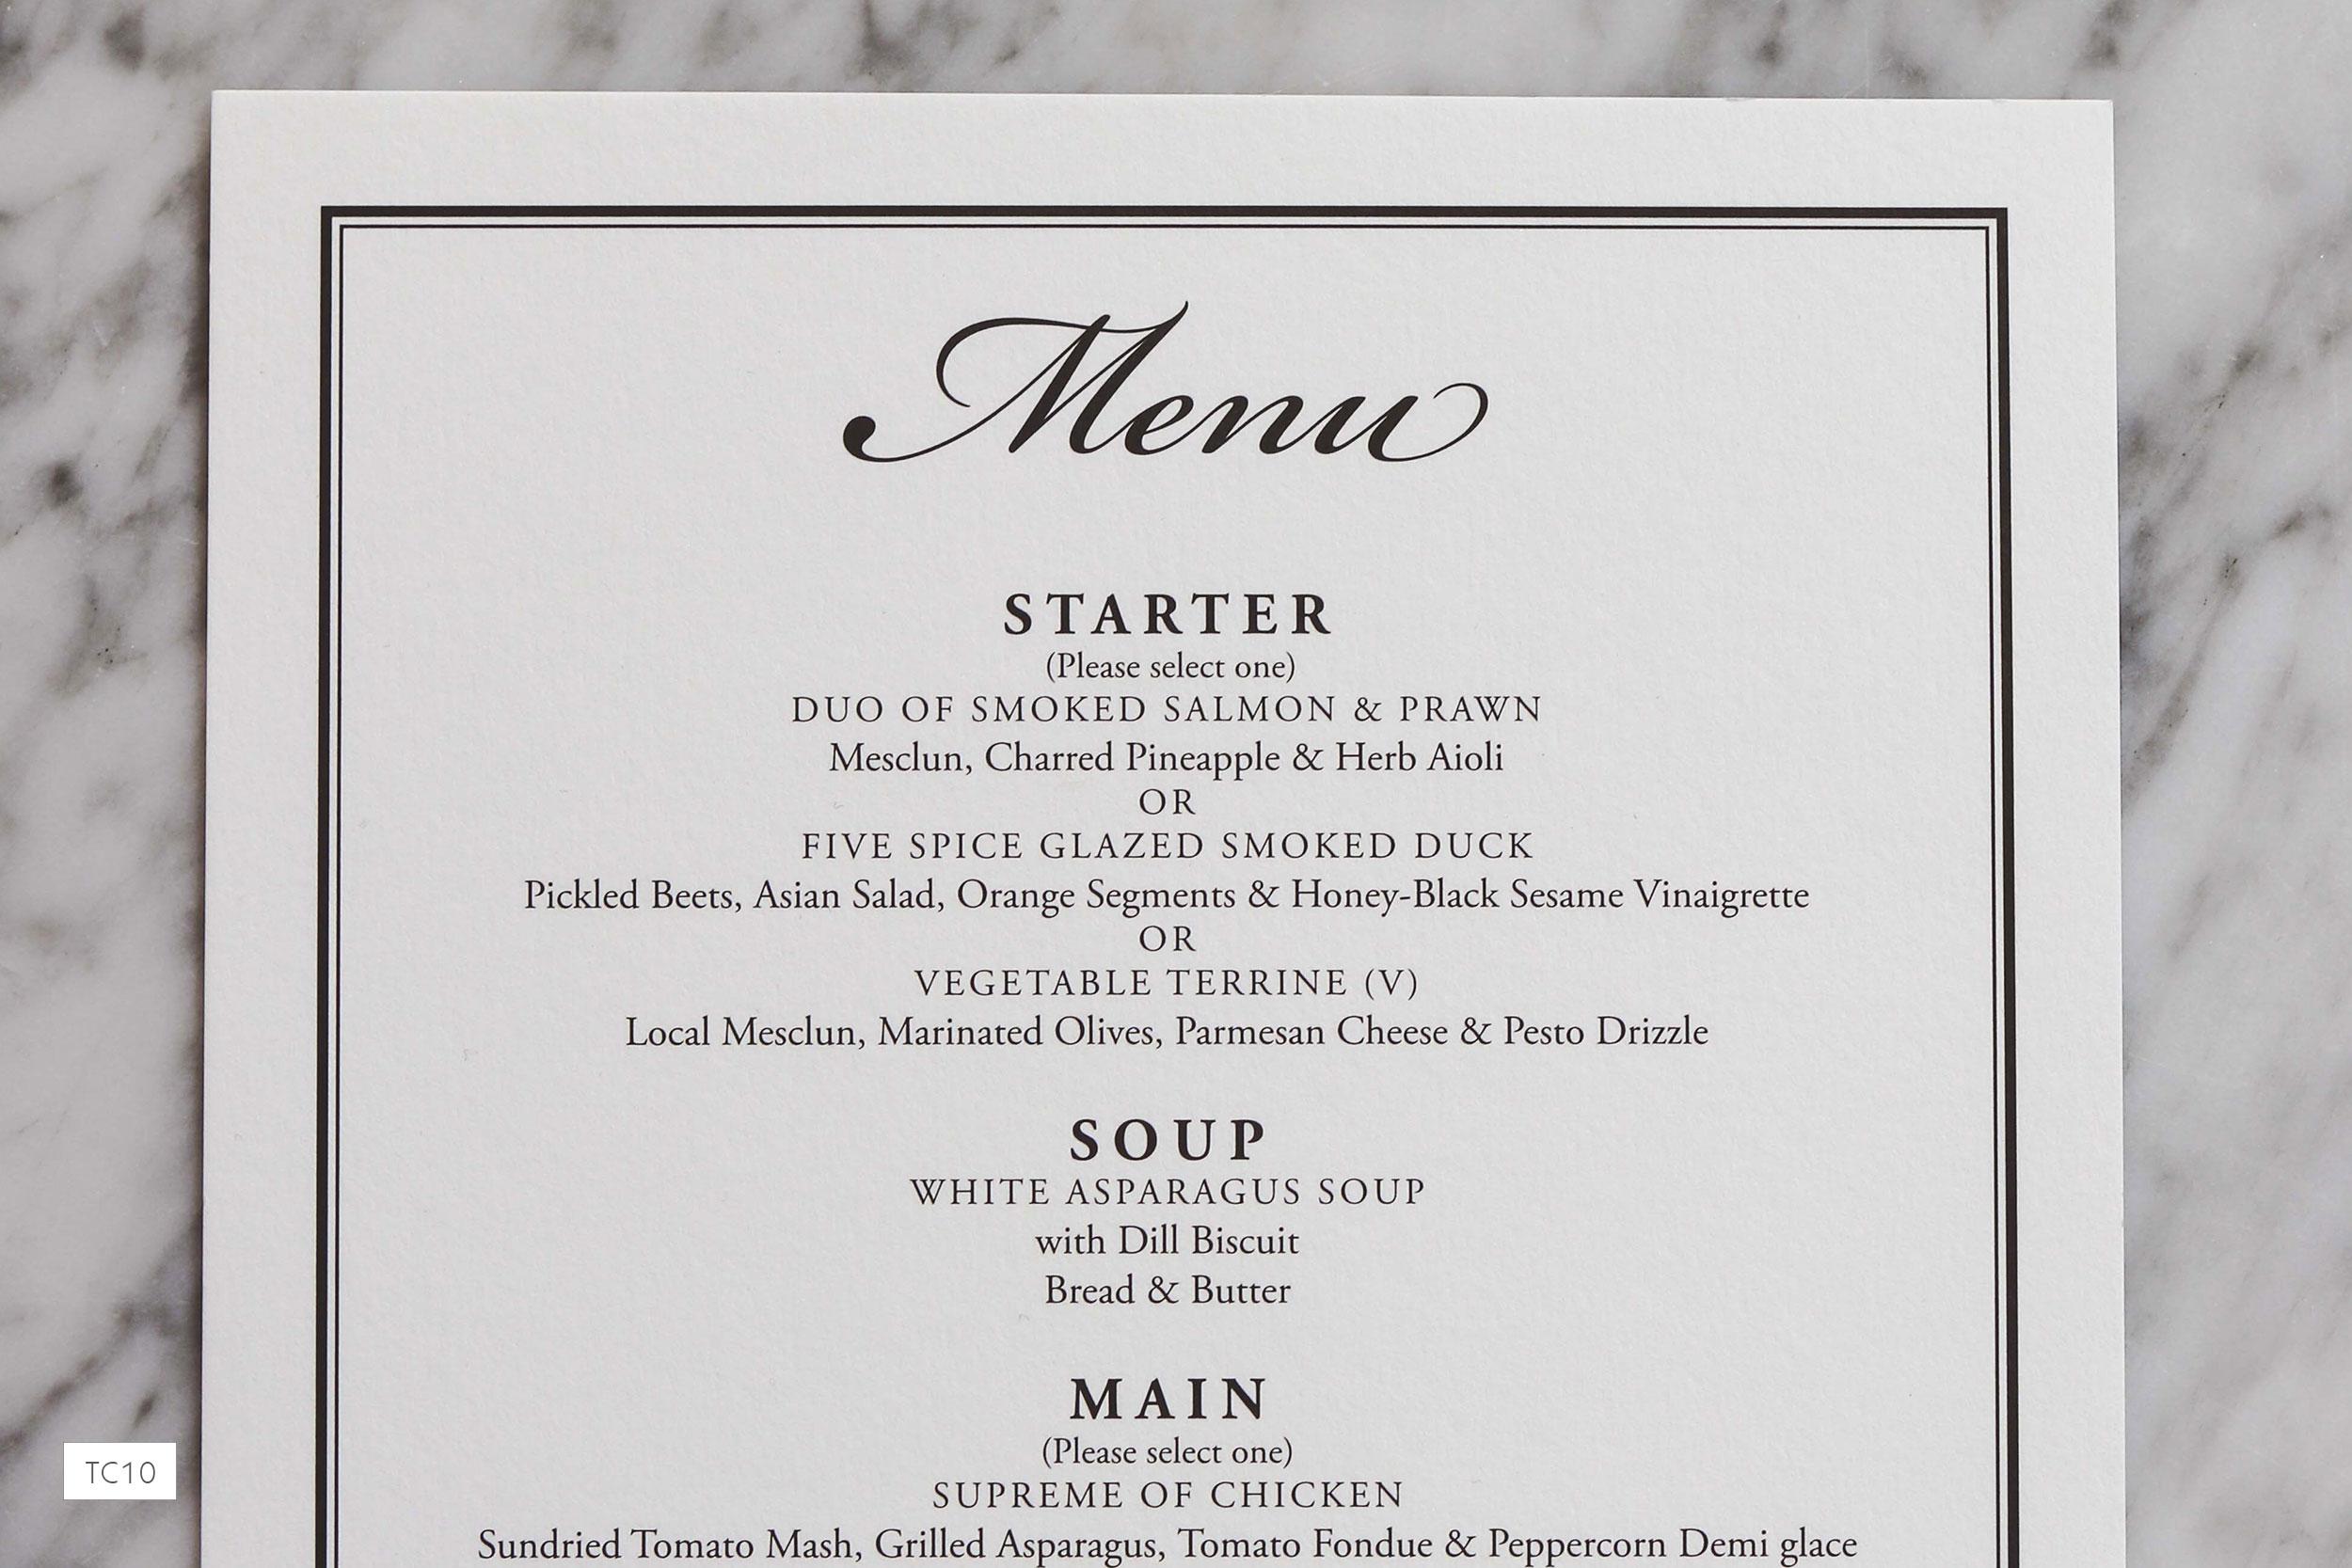 tc10-monochrome-wedding-menu.jpg